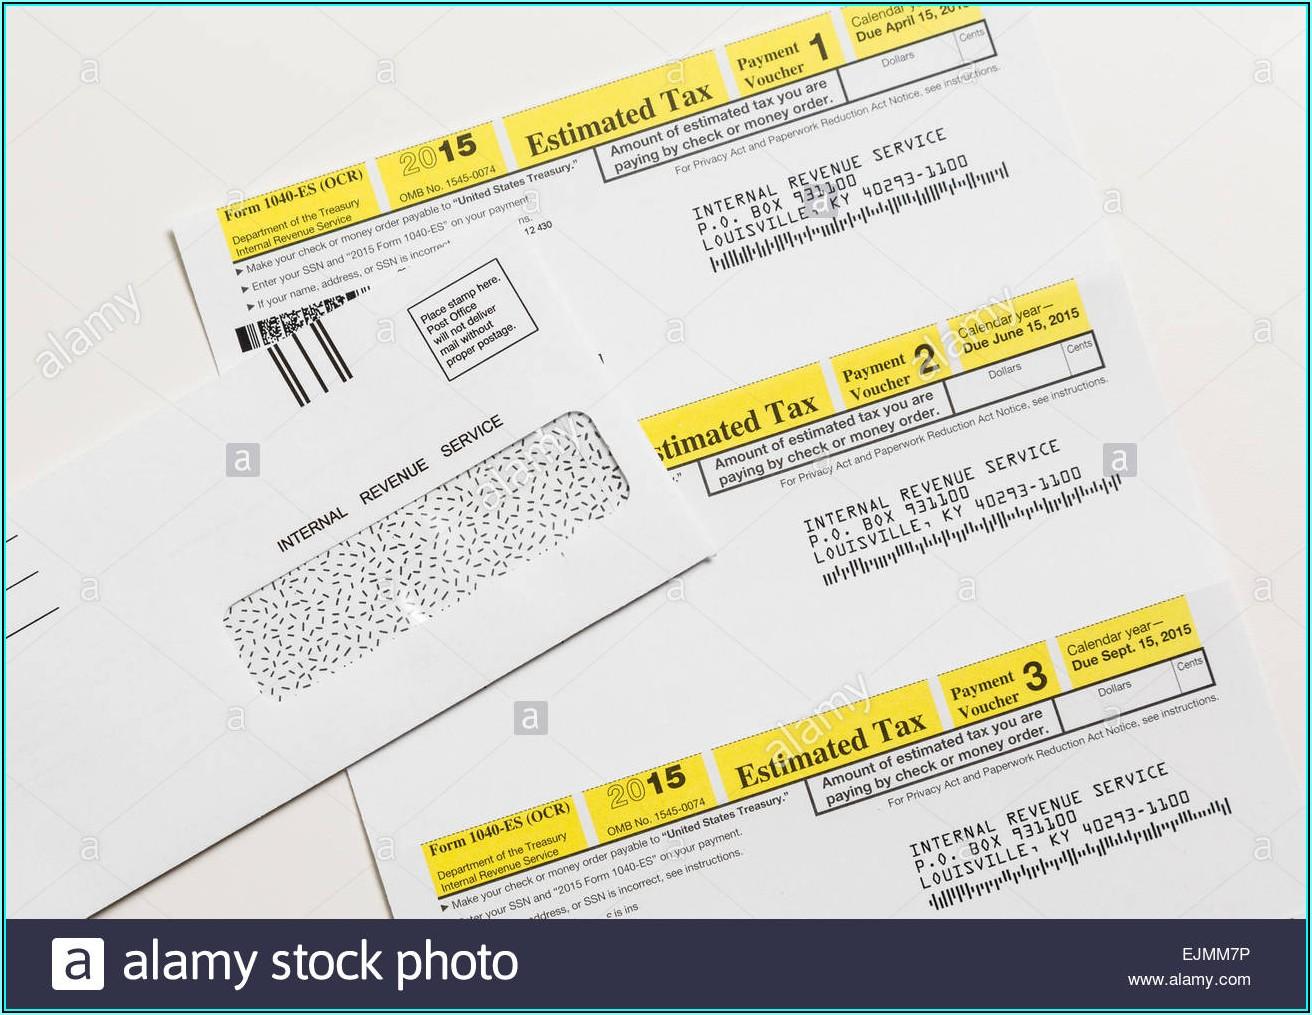 Internal Revenue Service Form 1040 Es Estimated Tax Individuals